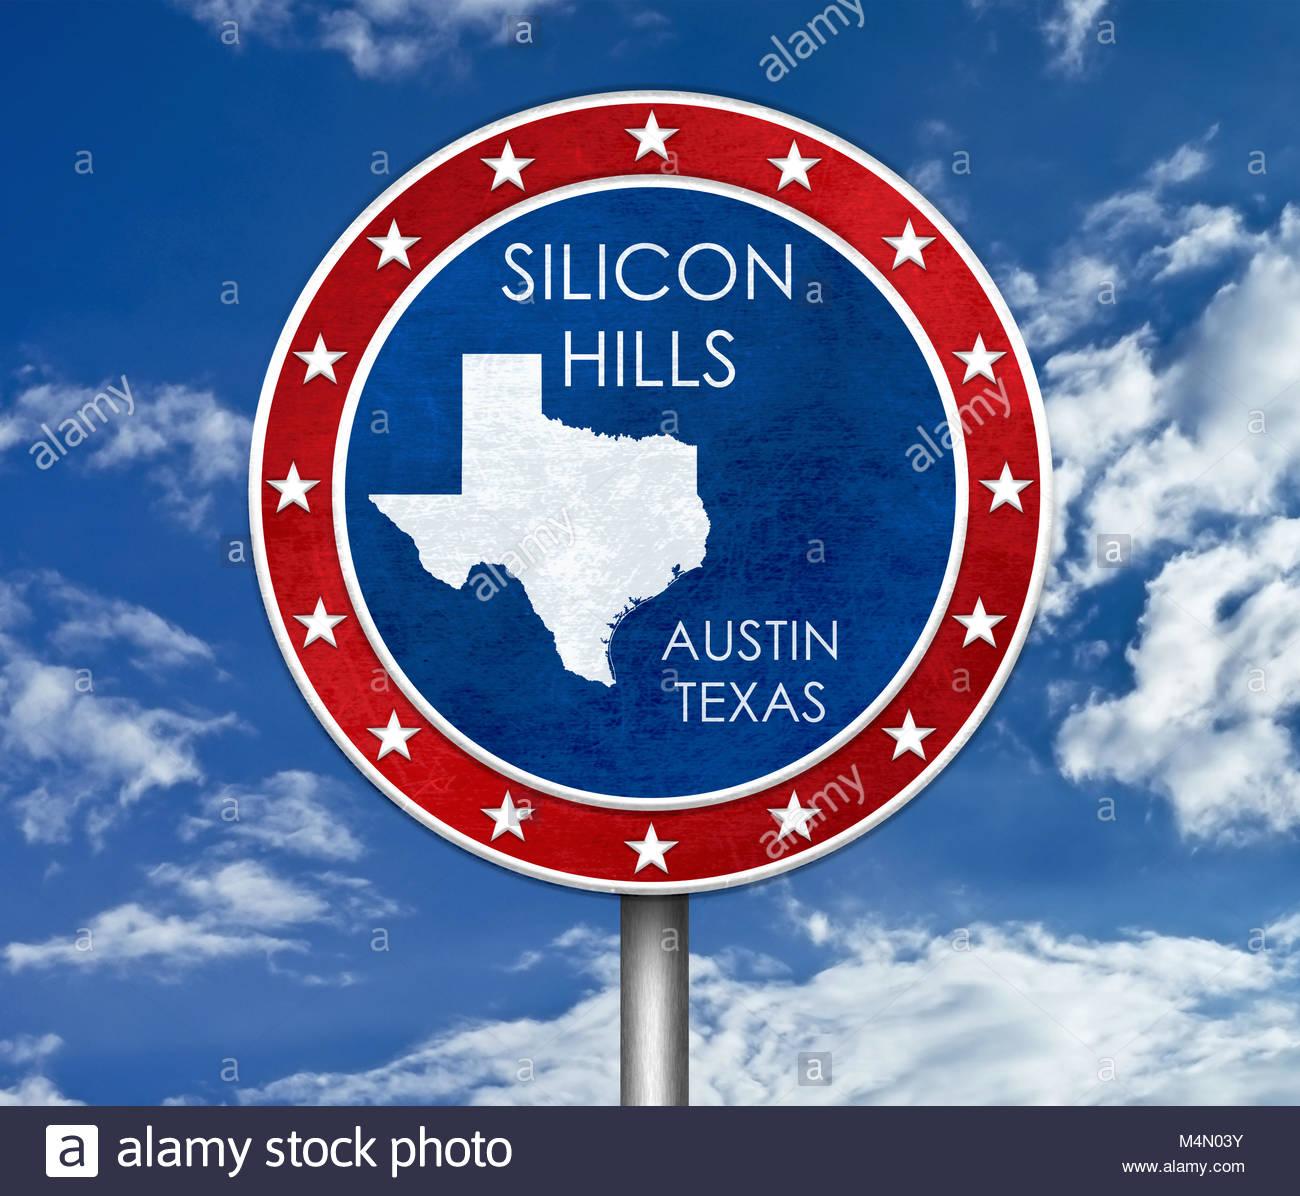 Silicon Hills in Austin Texas - Karte Abbildung Stockbild